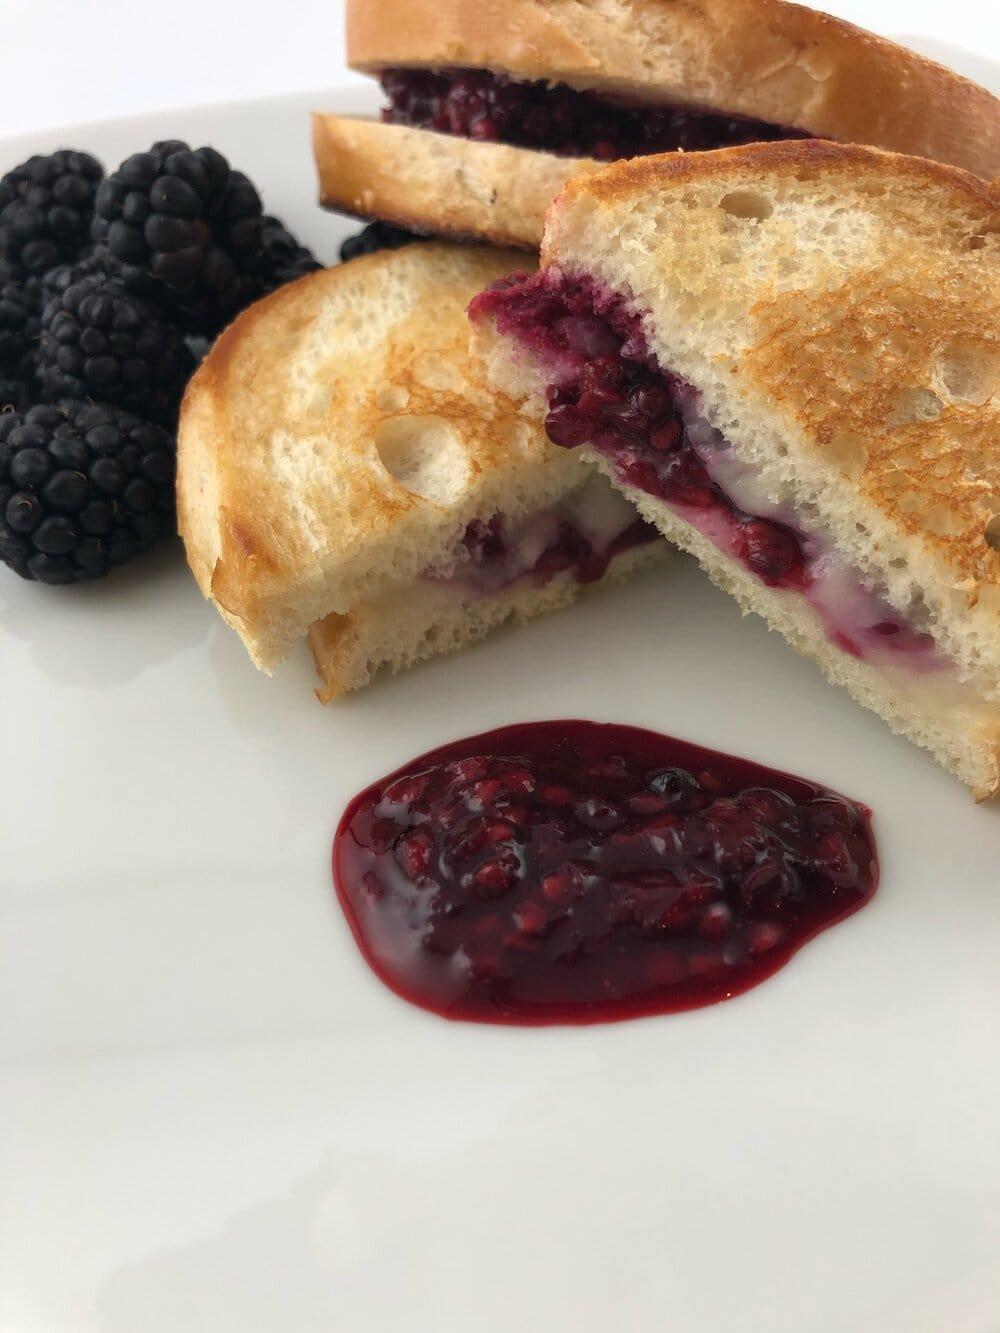 Missouri Girl Blackberry and Mozzarella Grilled Cheese Sandwich. Missouri Girl Blog